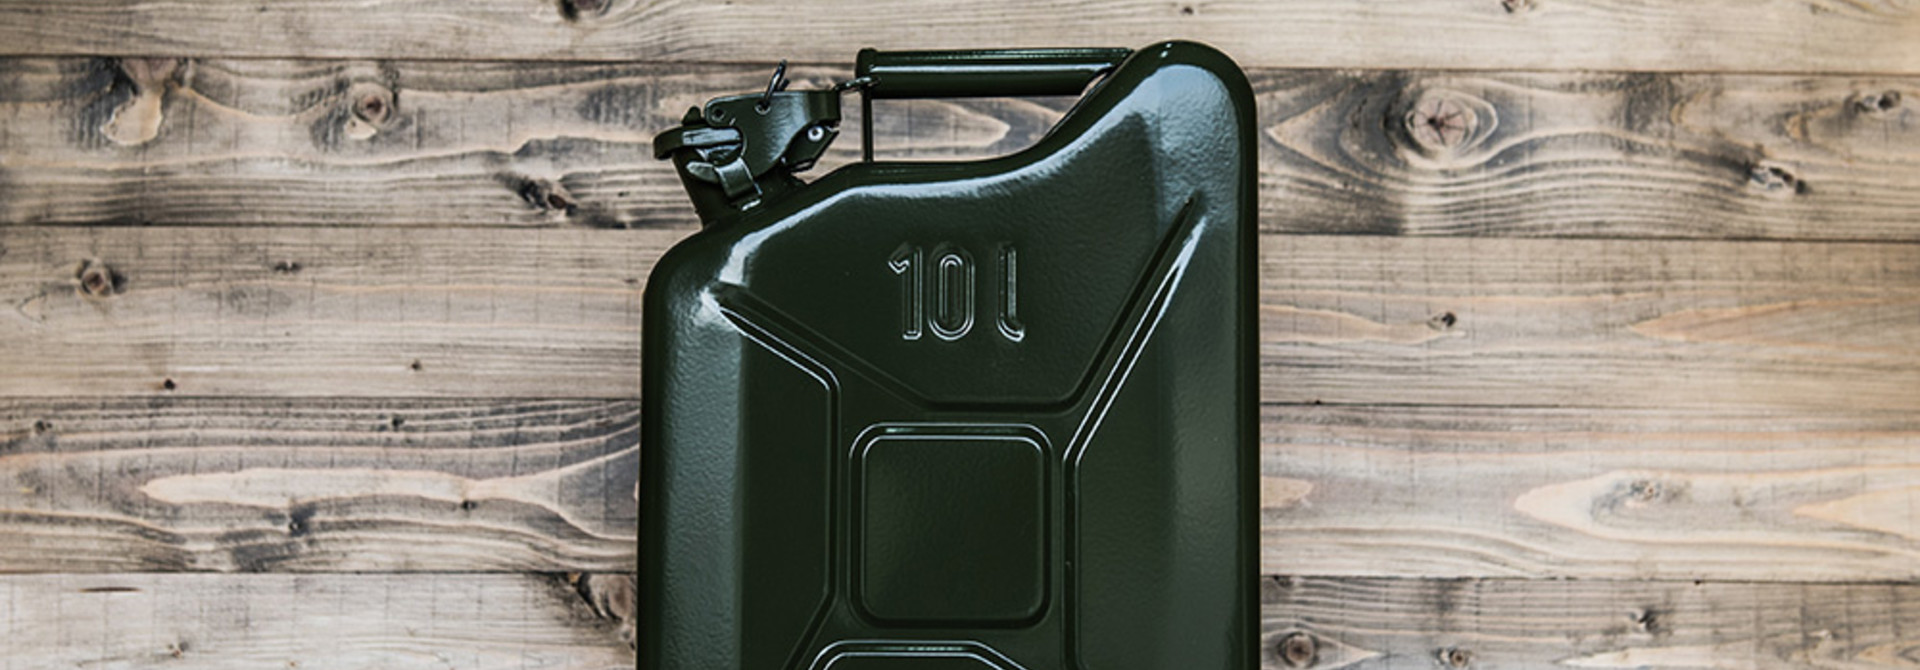 Steel jerrycan 10L